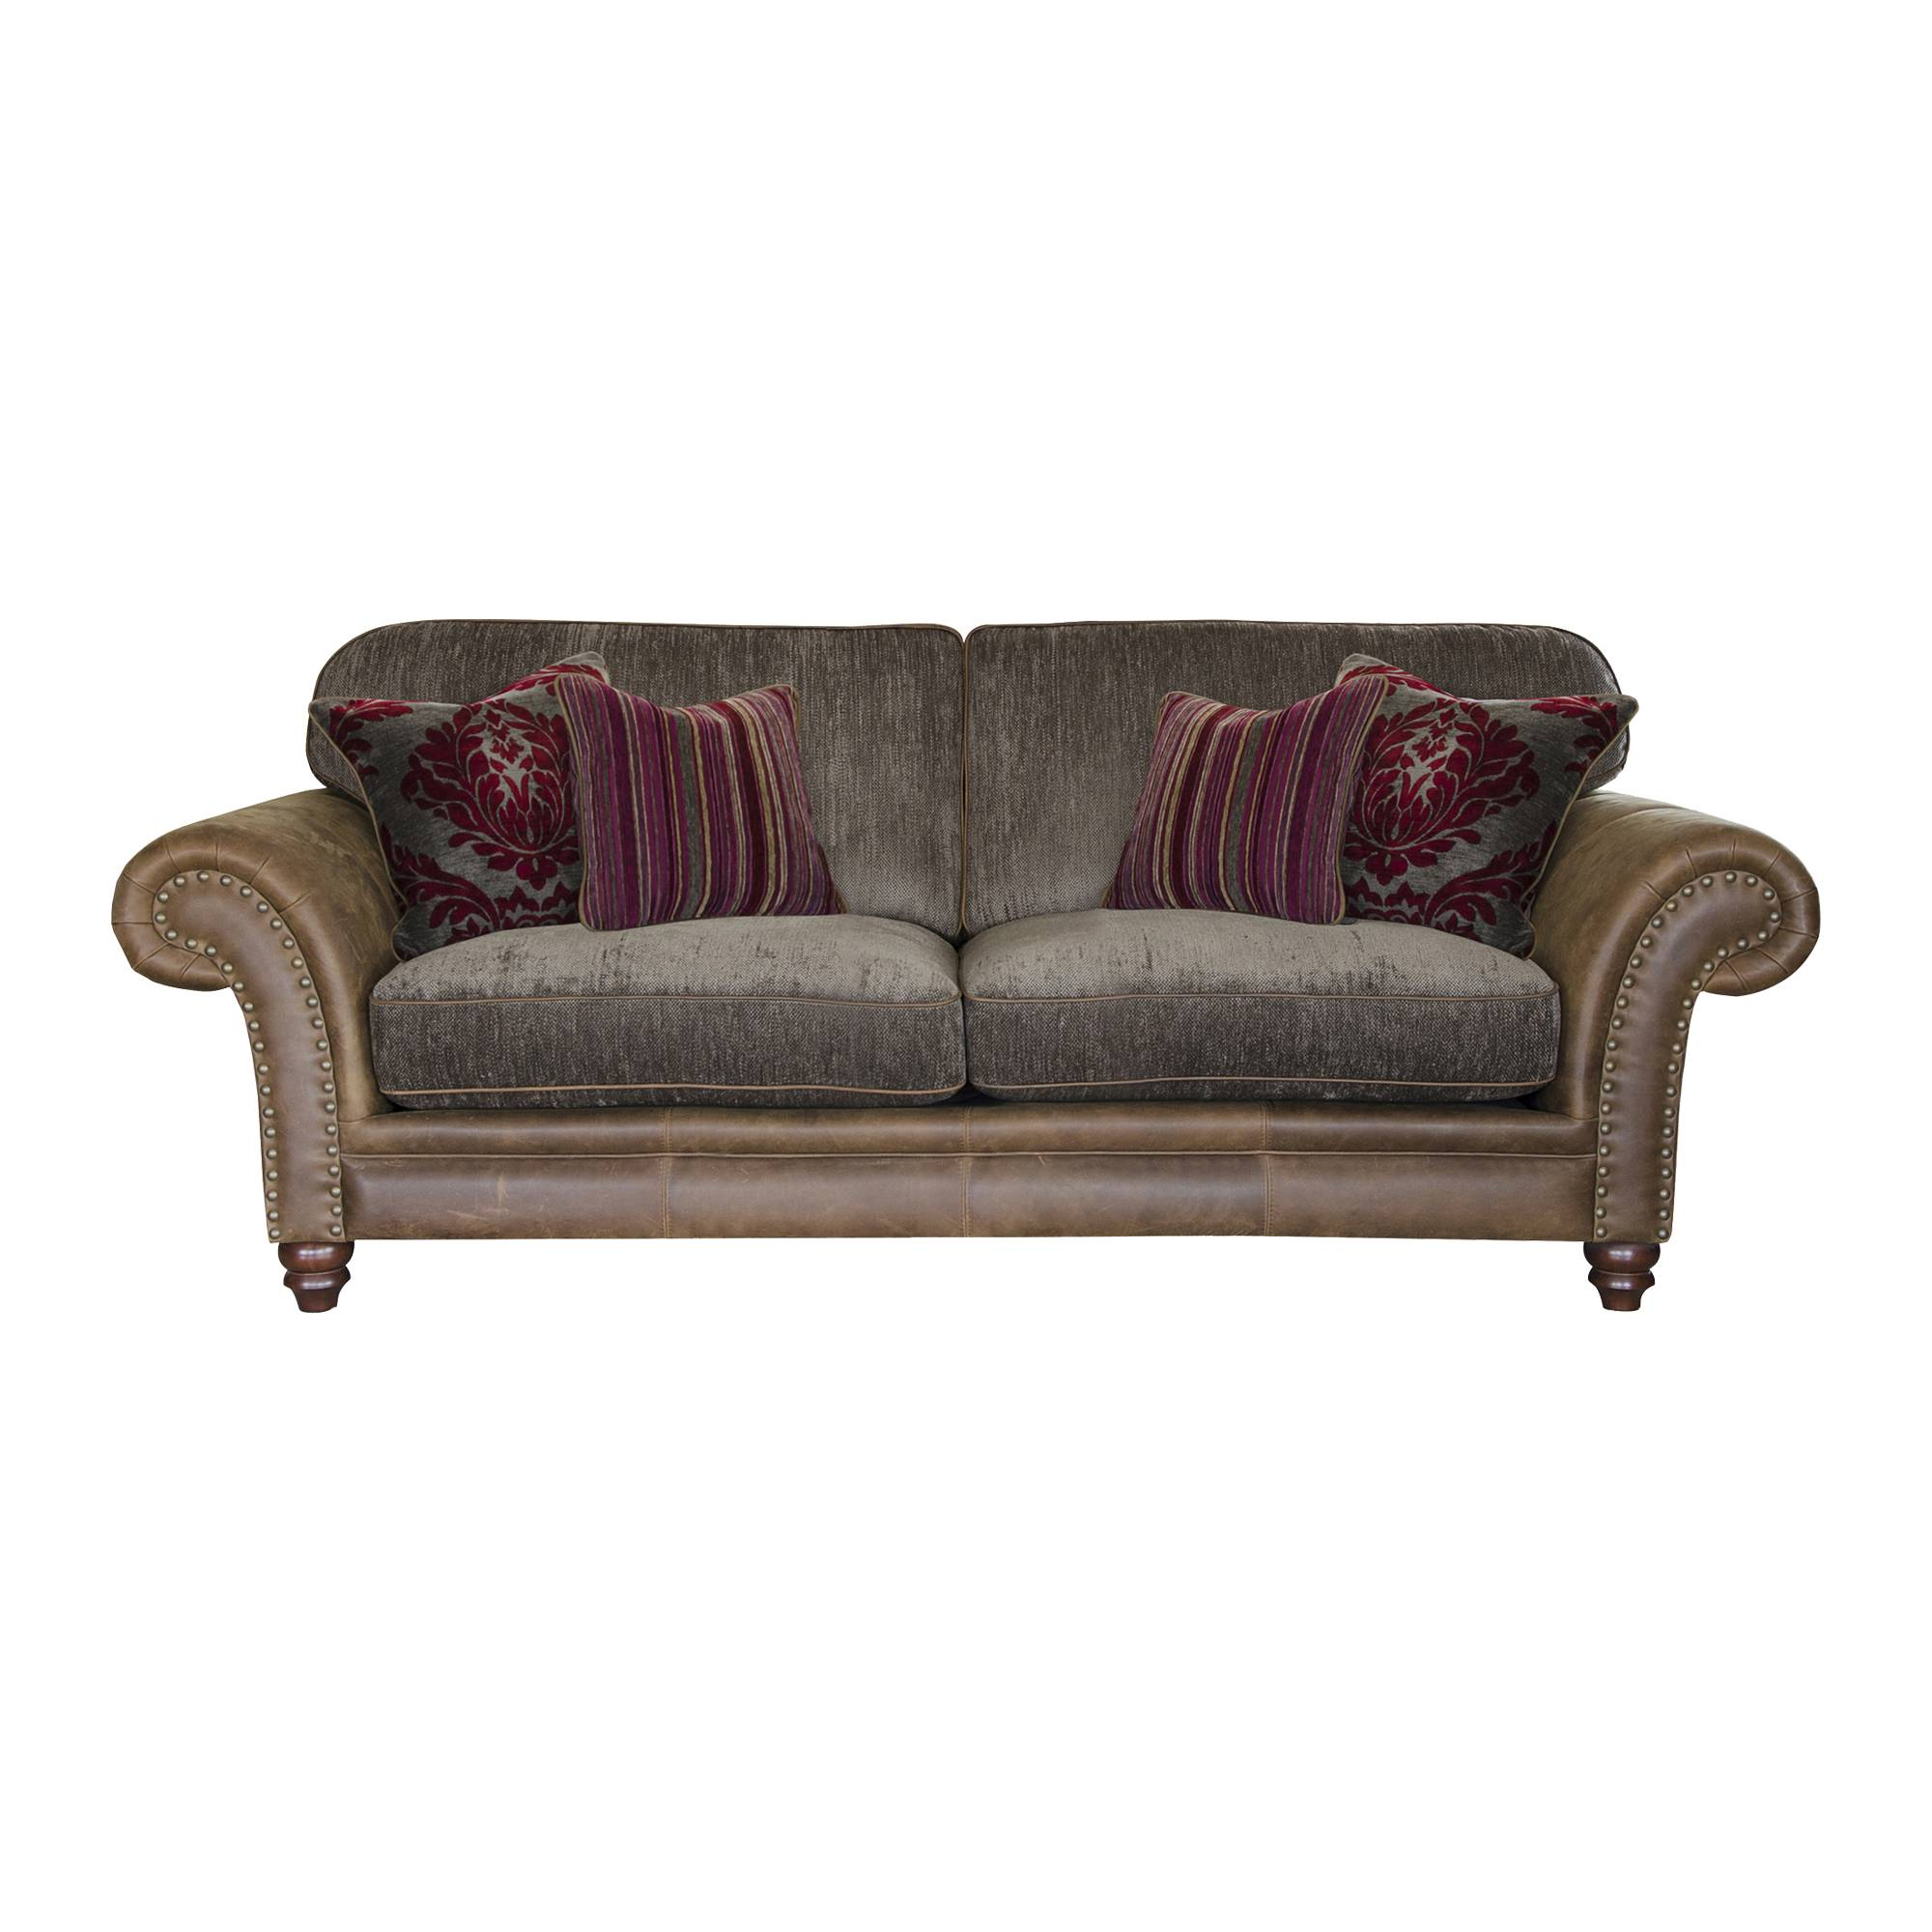 Alexander James Hudson 3 Seater Sofa Option 1 Fabric Leather